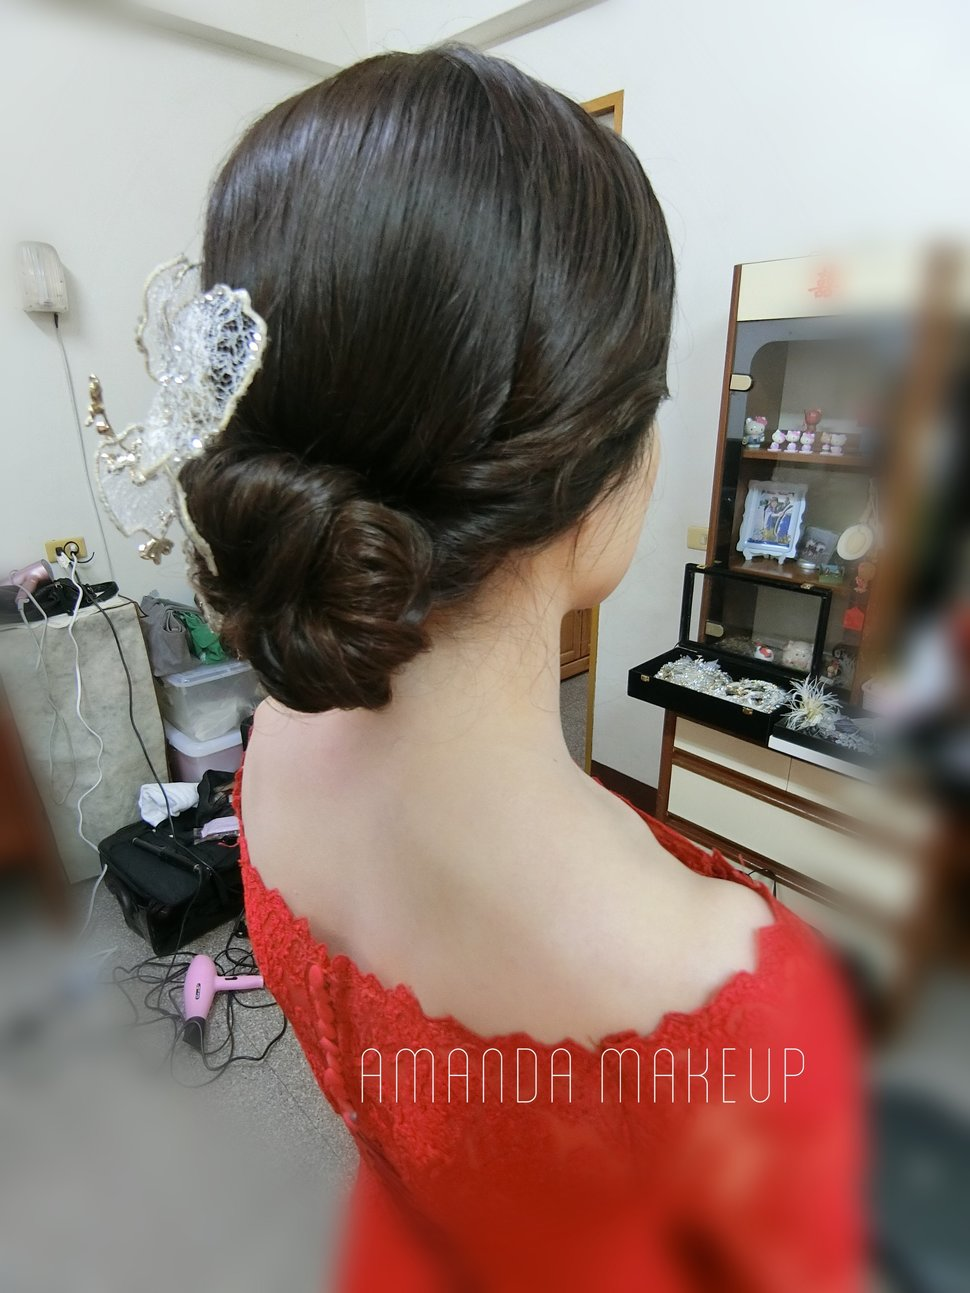 E735E351-5AB8-48E8-8BAB-2876A4A354A5 - Amanda Makeup Studio - 結婚吧